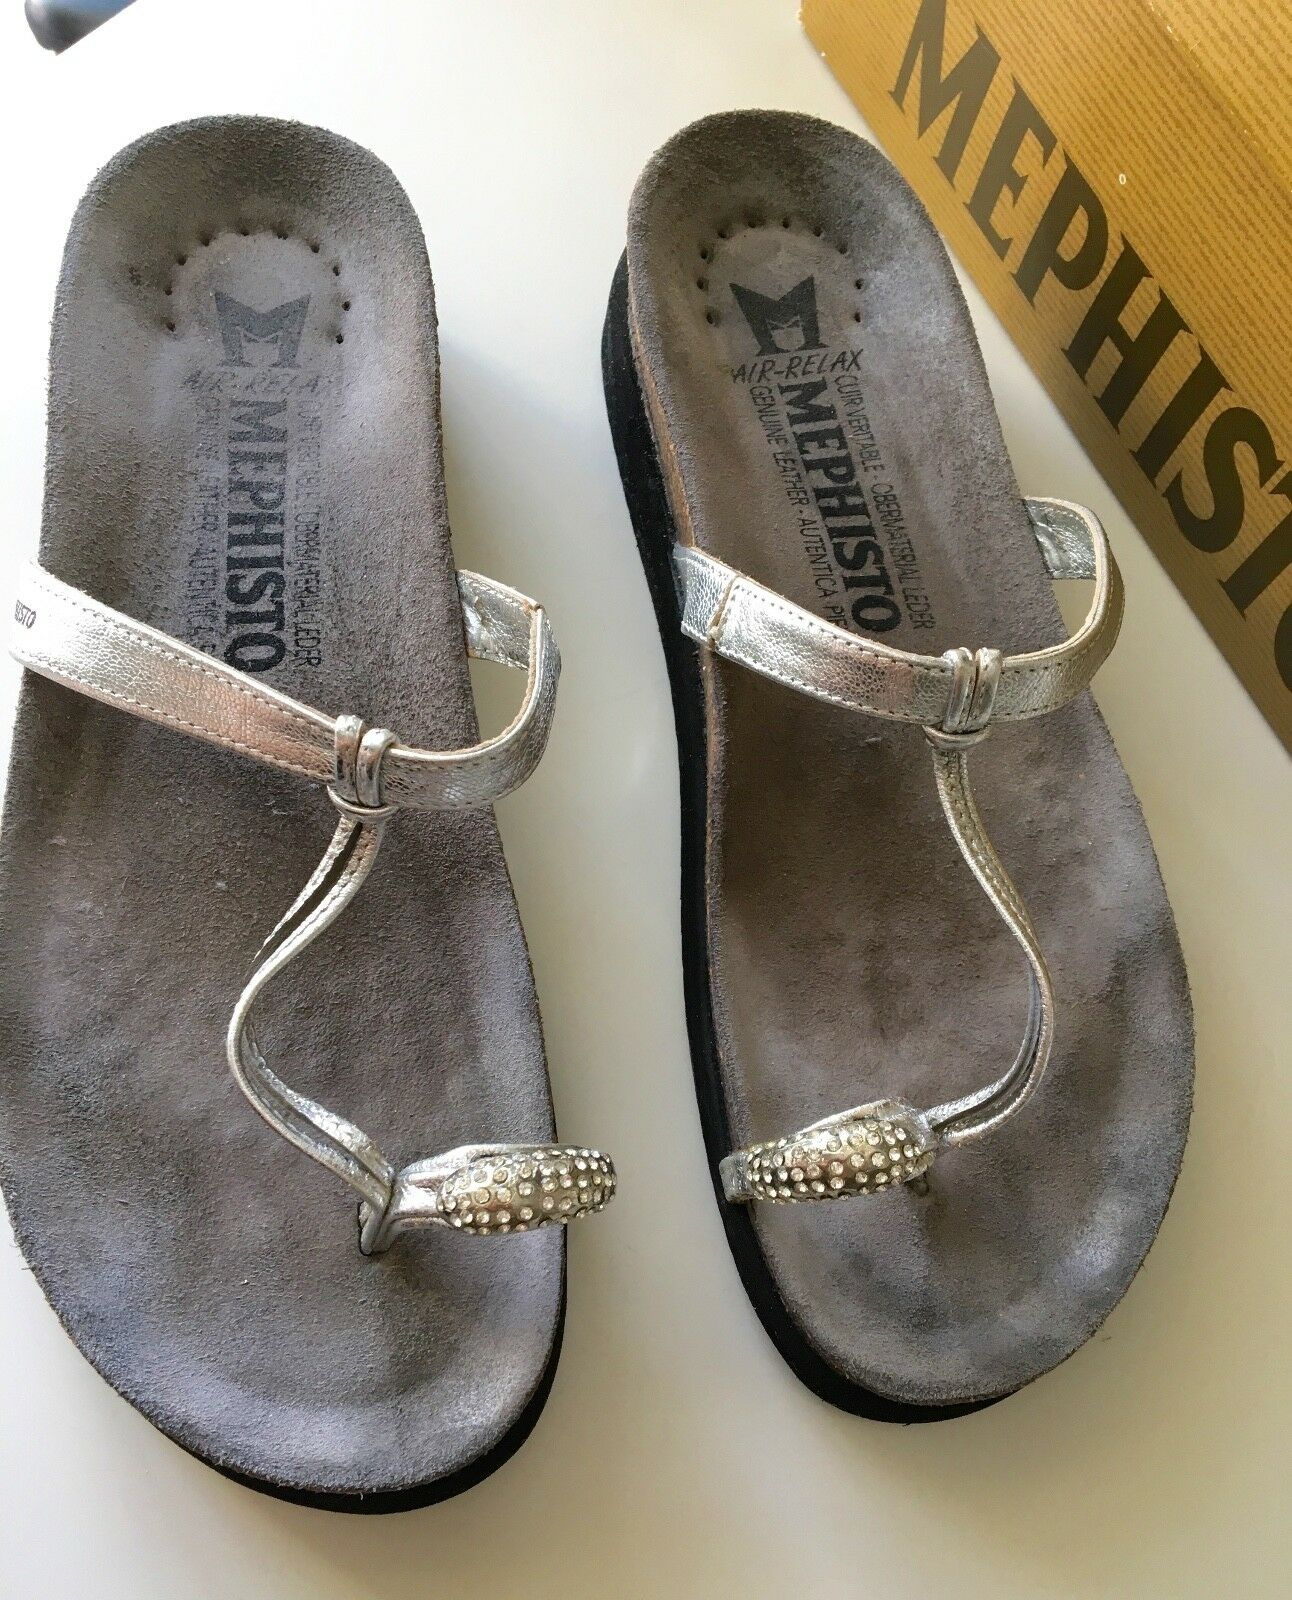 Mephisto Silver HATTY Women's Sandals w  Jewel Encrusted Toe Ring – Size 41 EU